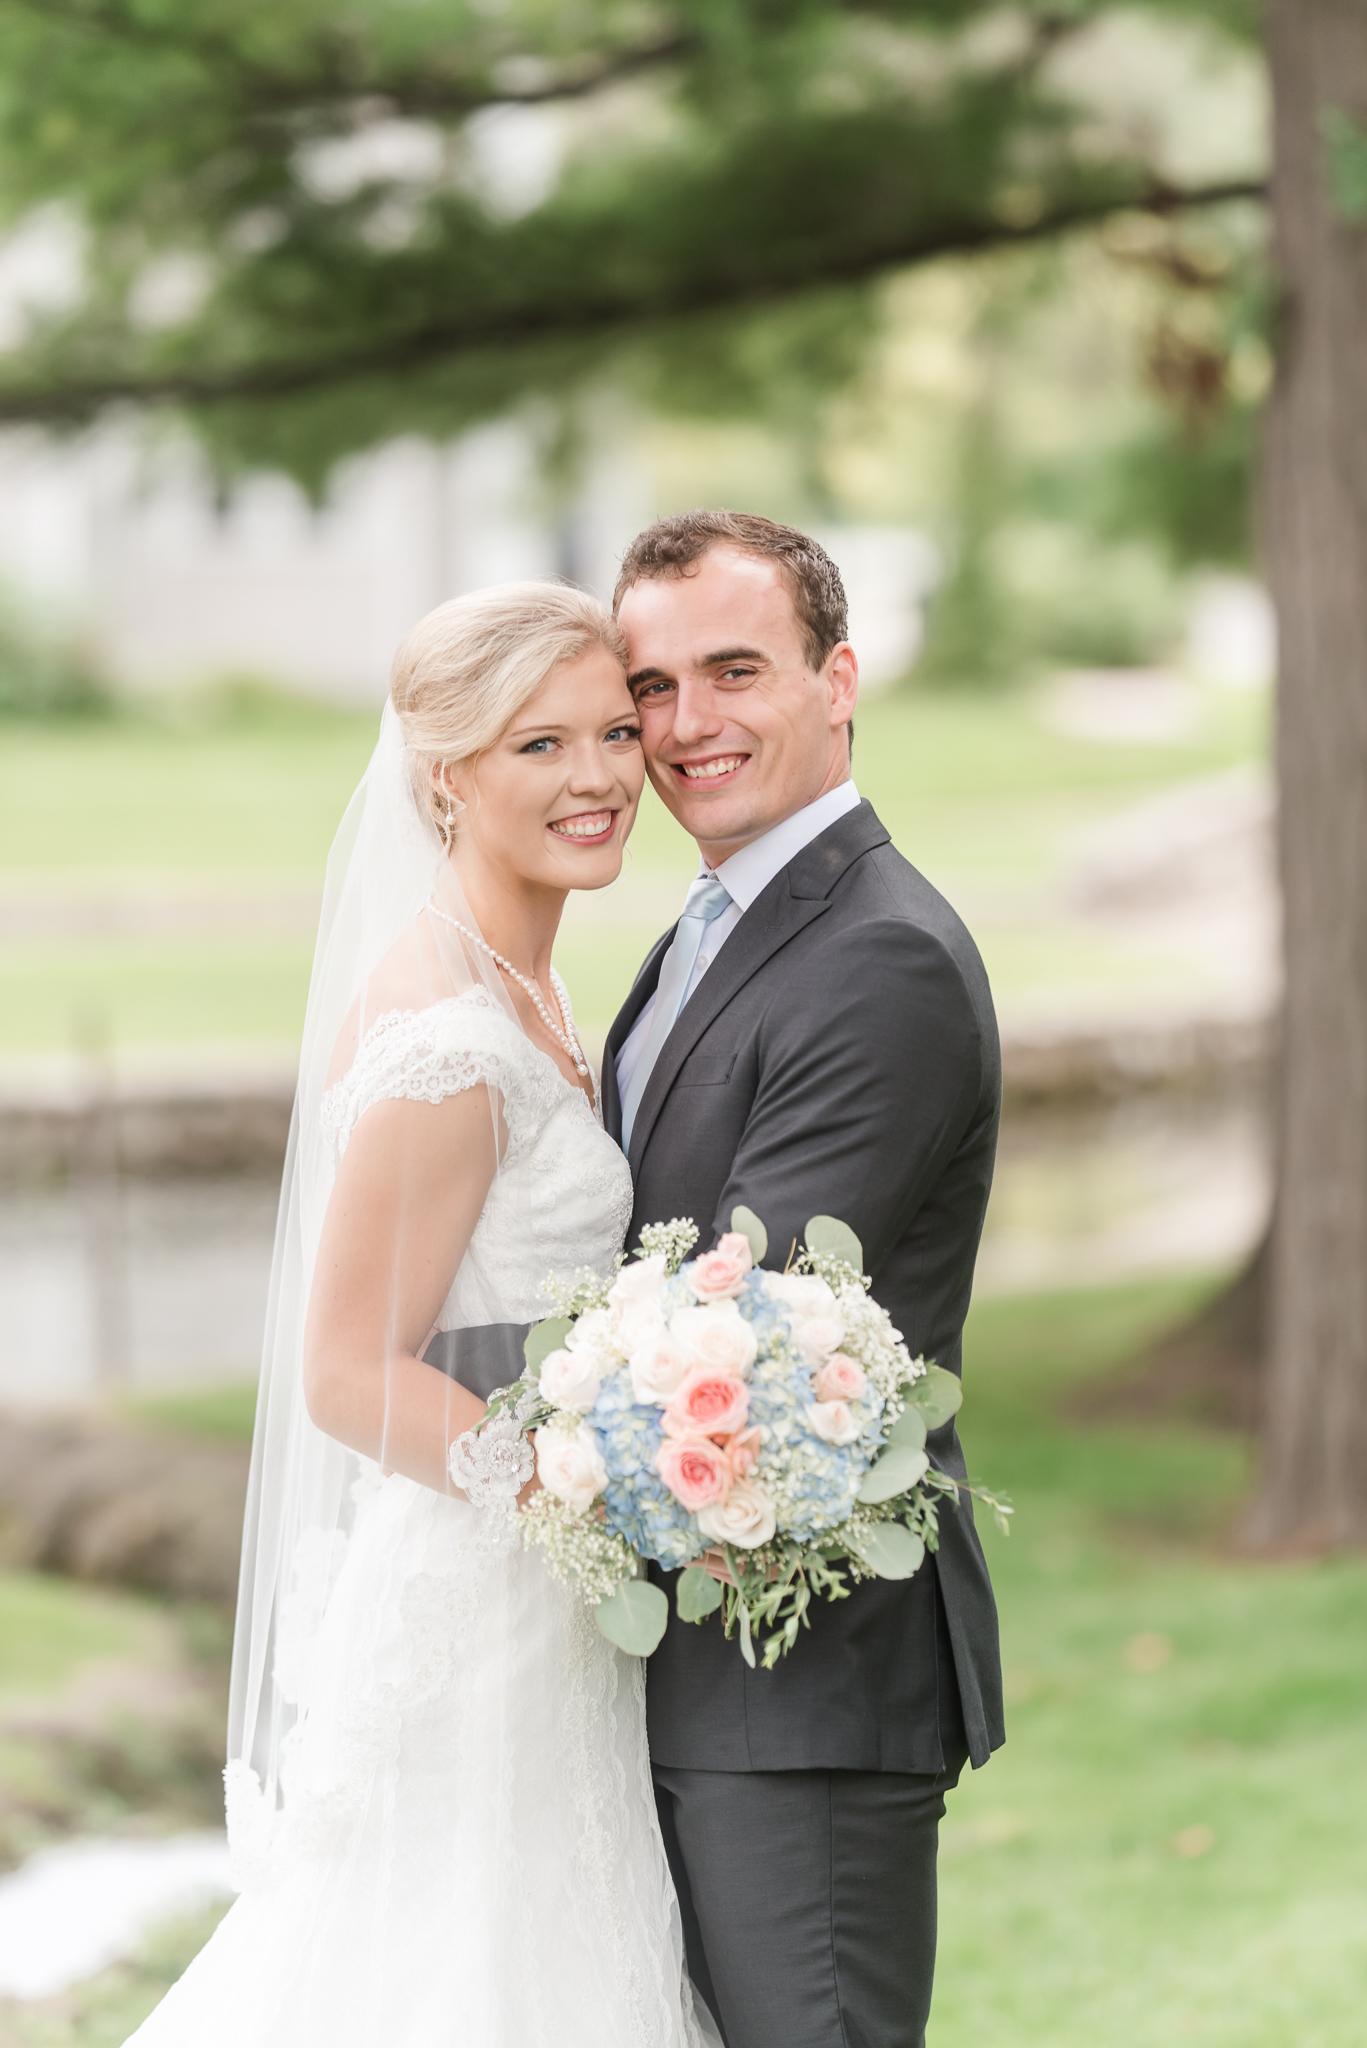 Westminister Hall Wedding Winona Lake Indiana8486.jpg